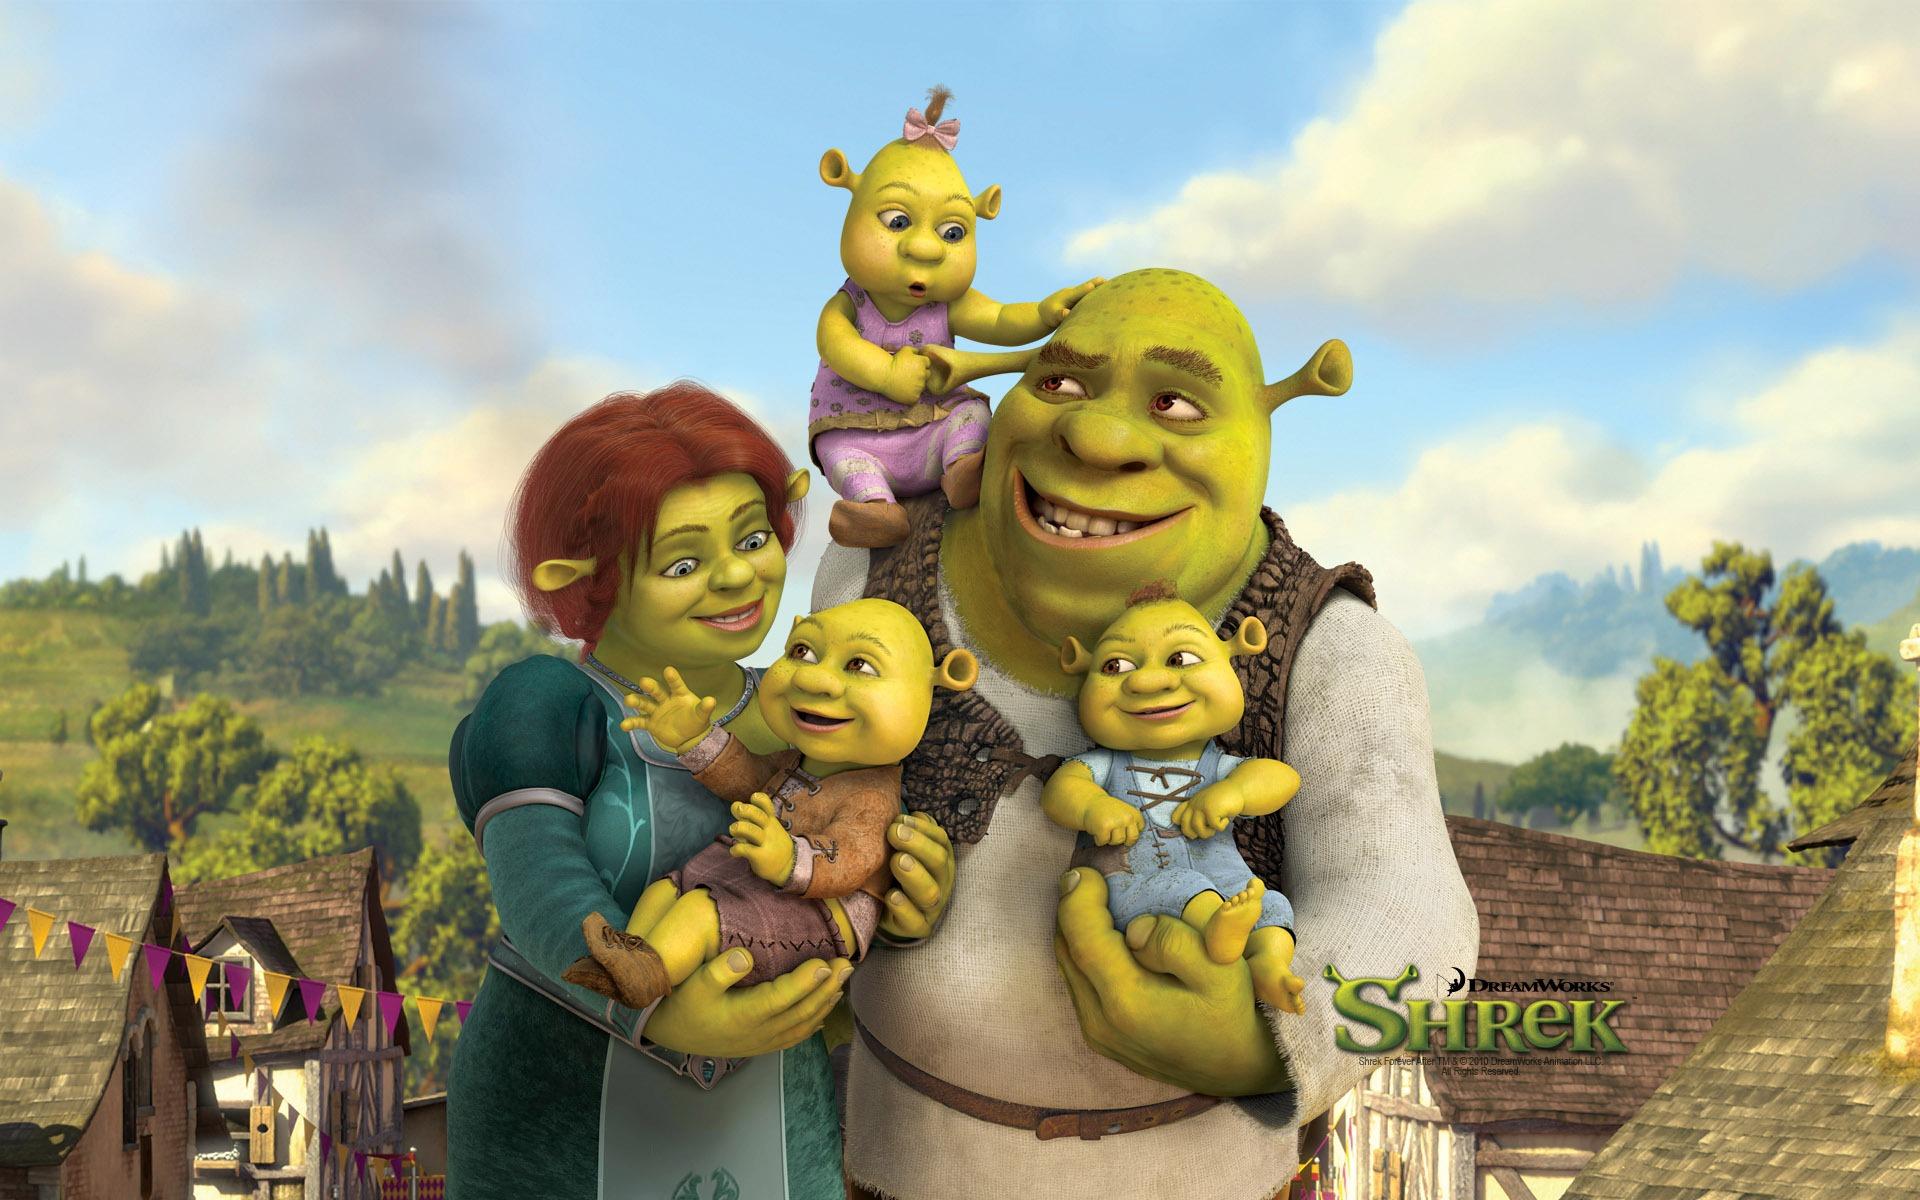 Shrek Forever After Hd Wallpaper 1 1920x1200 Wallpaper Download